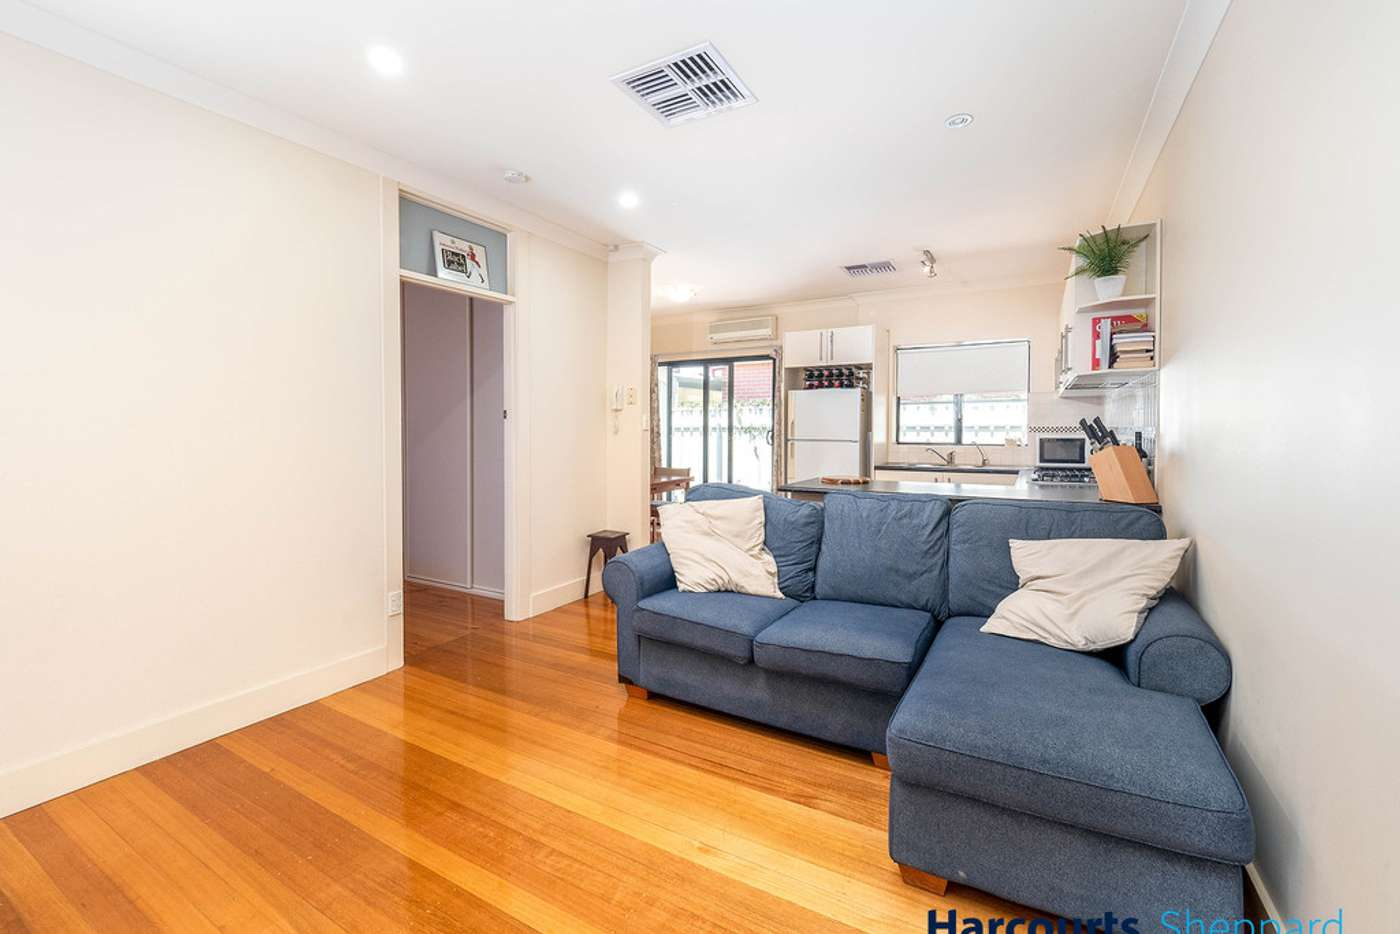 Sixth view of Homely unit listing, 3/32 Charles Sturt Avenue, Grange SA 5022